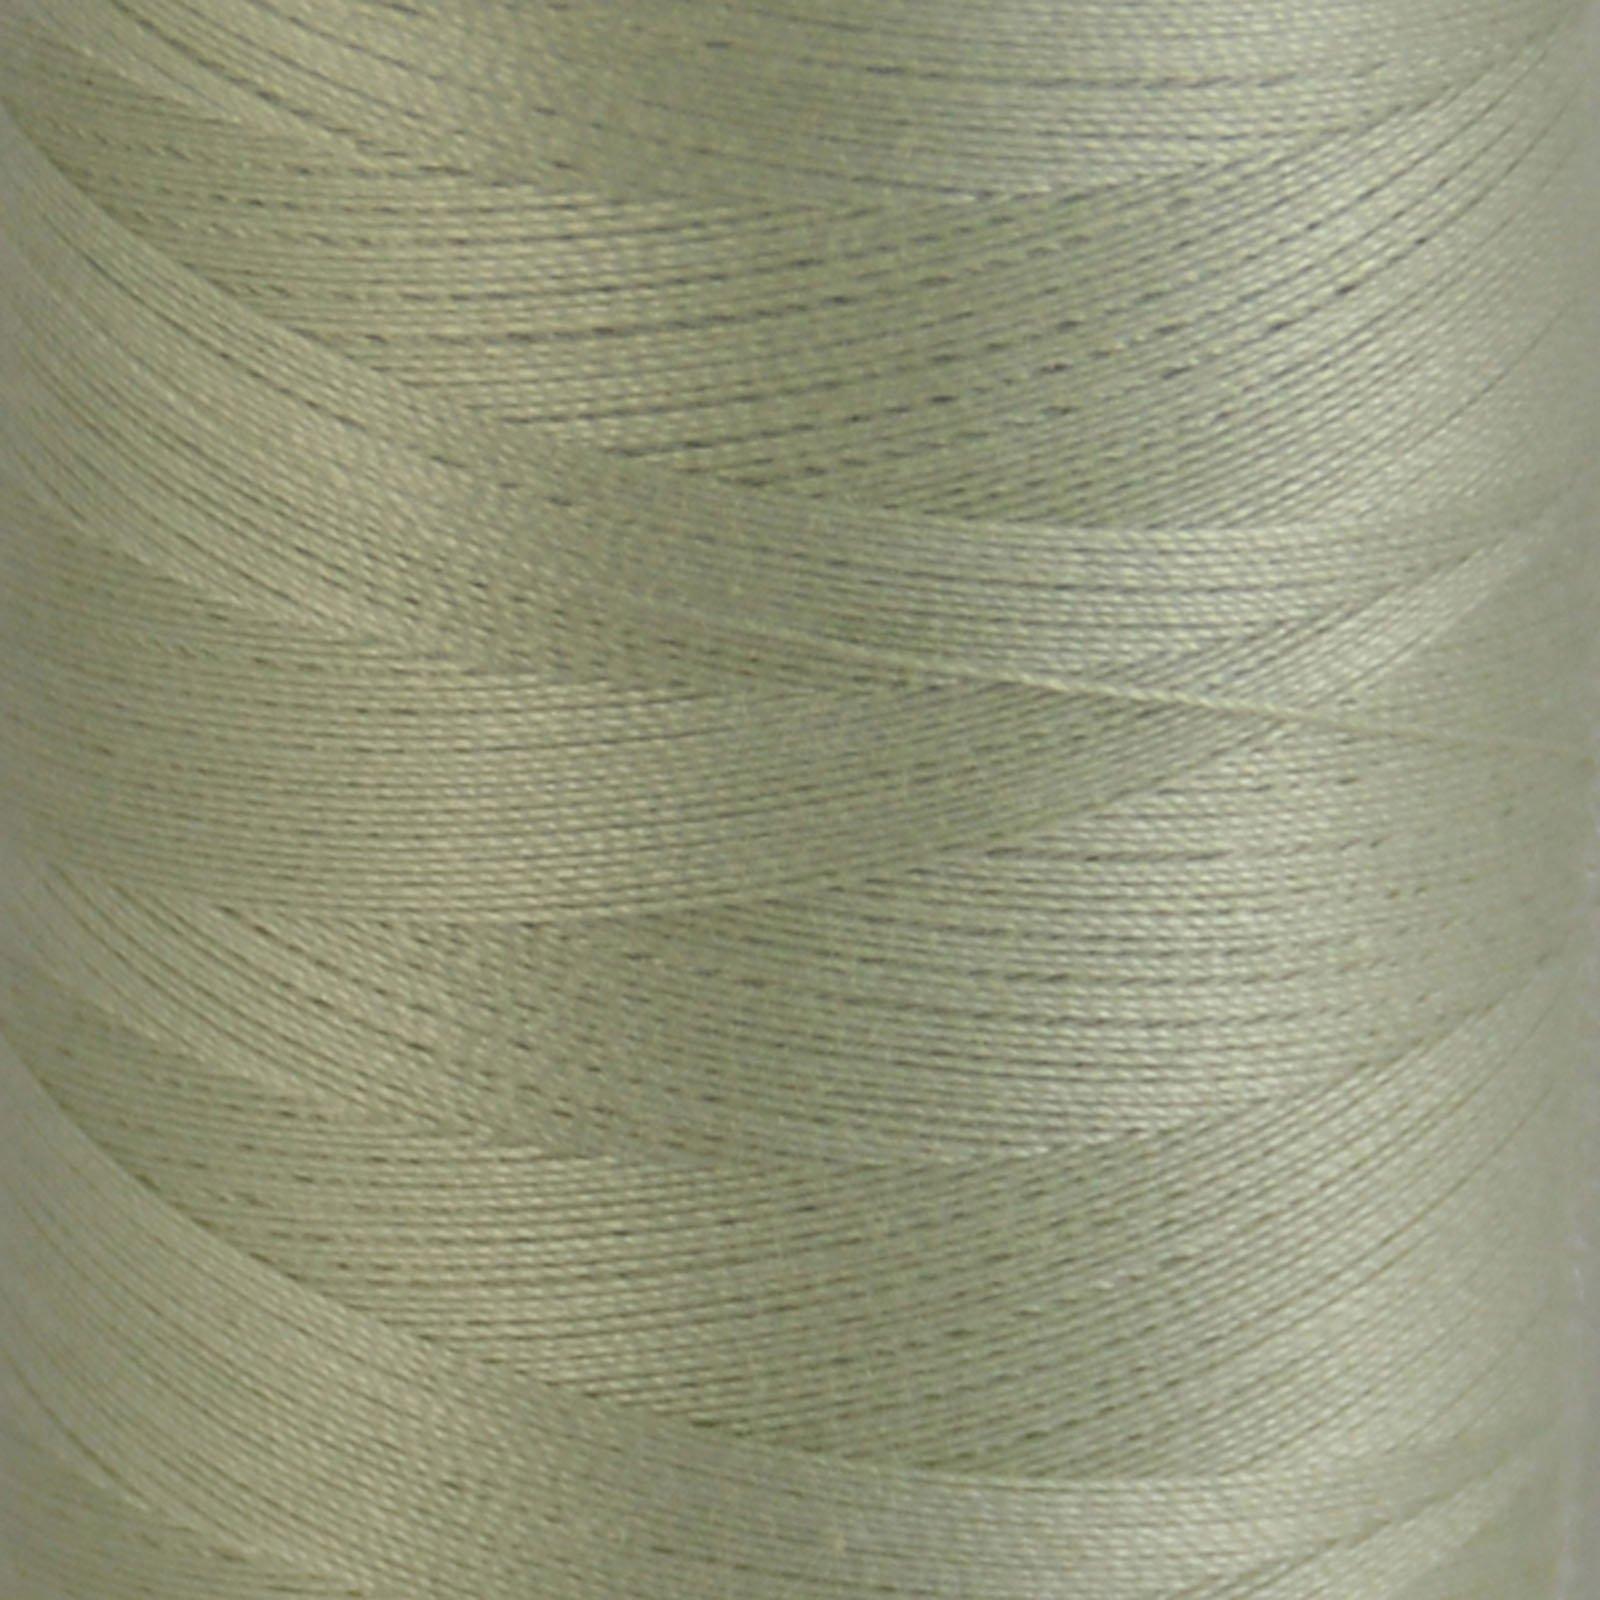 # 2843 Light Grey Green